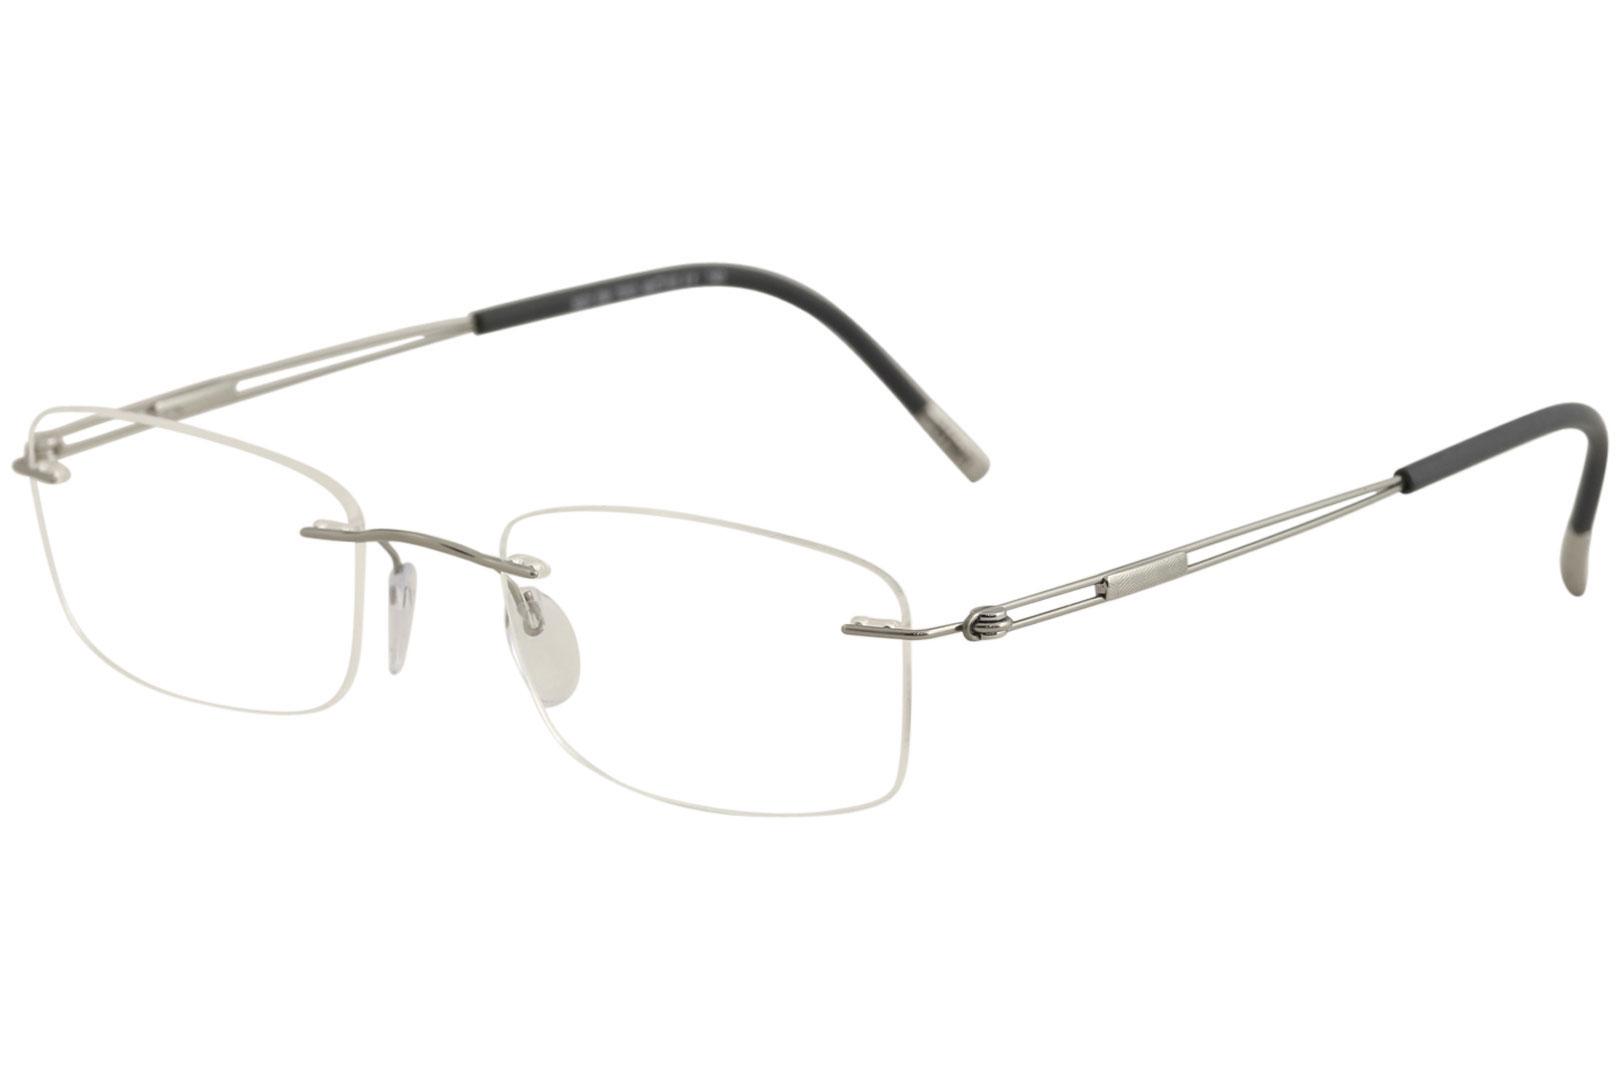 e99ec22023 Silhouette Eyeglasses TNG Titan Next Generation Chassis 5521 7010 ...